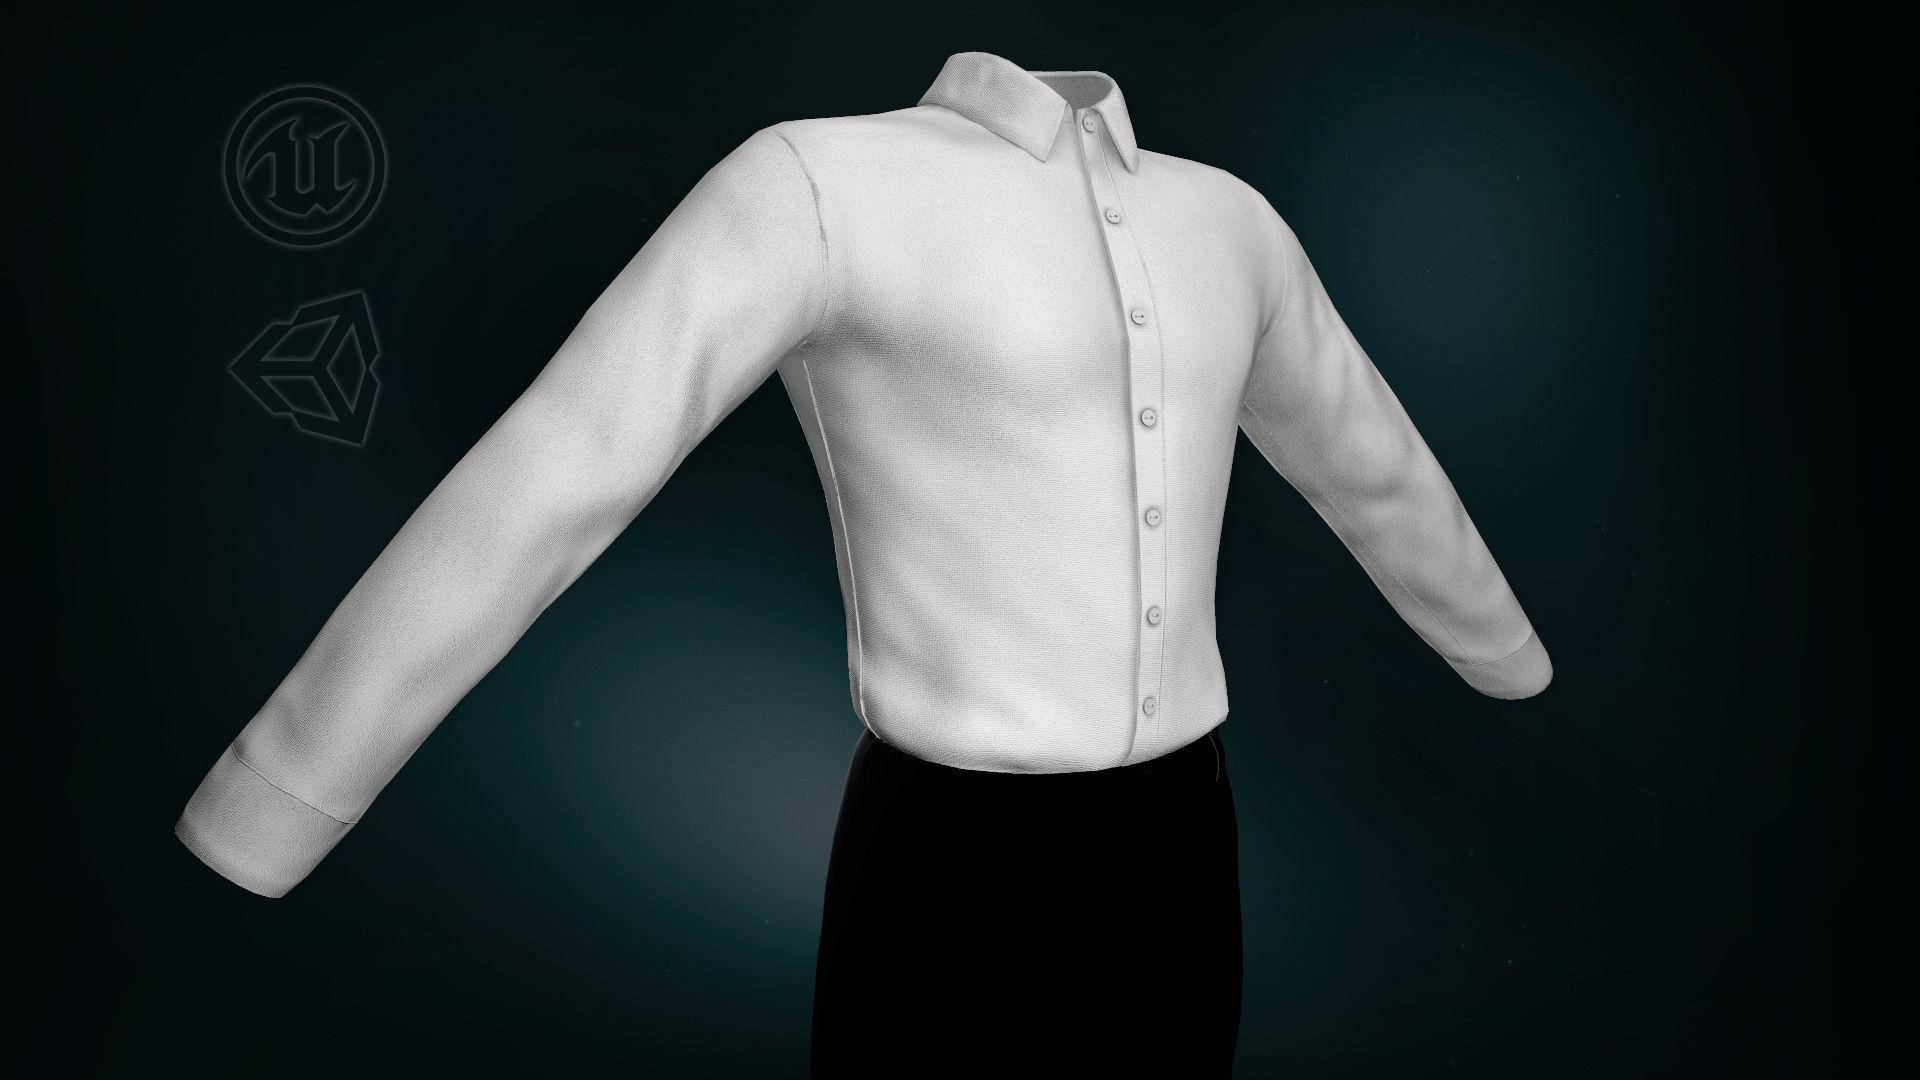 White Suit Shirt